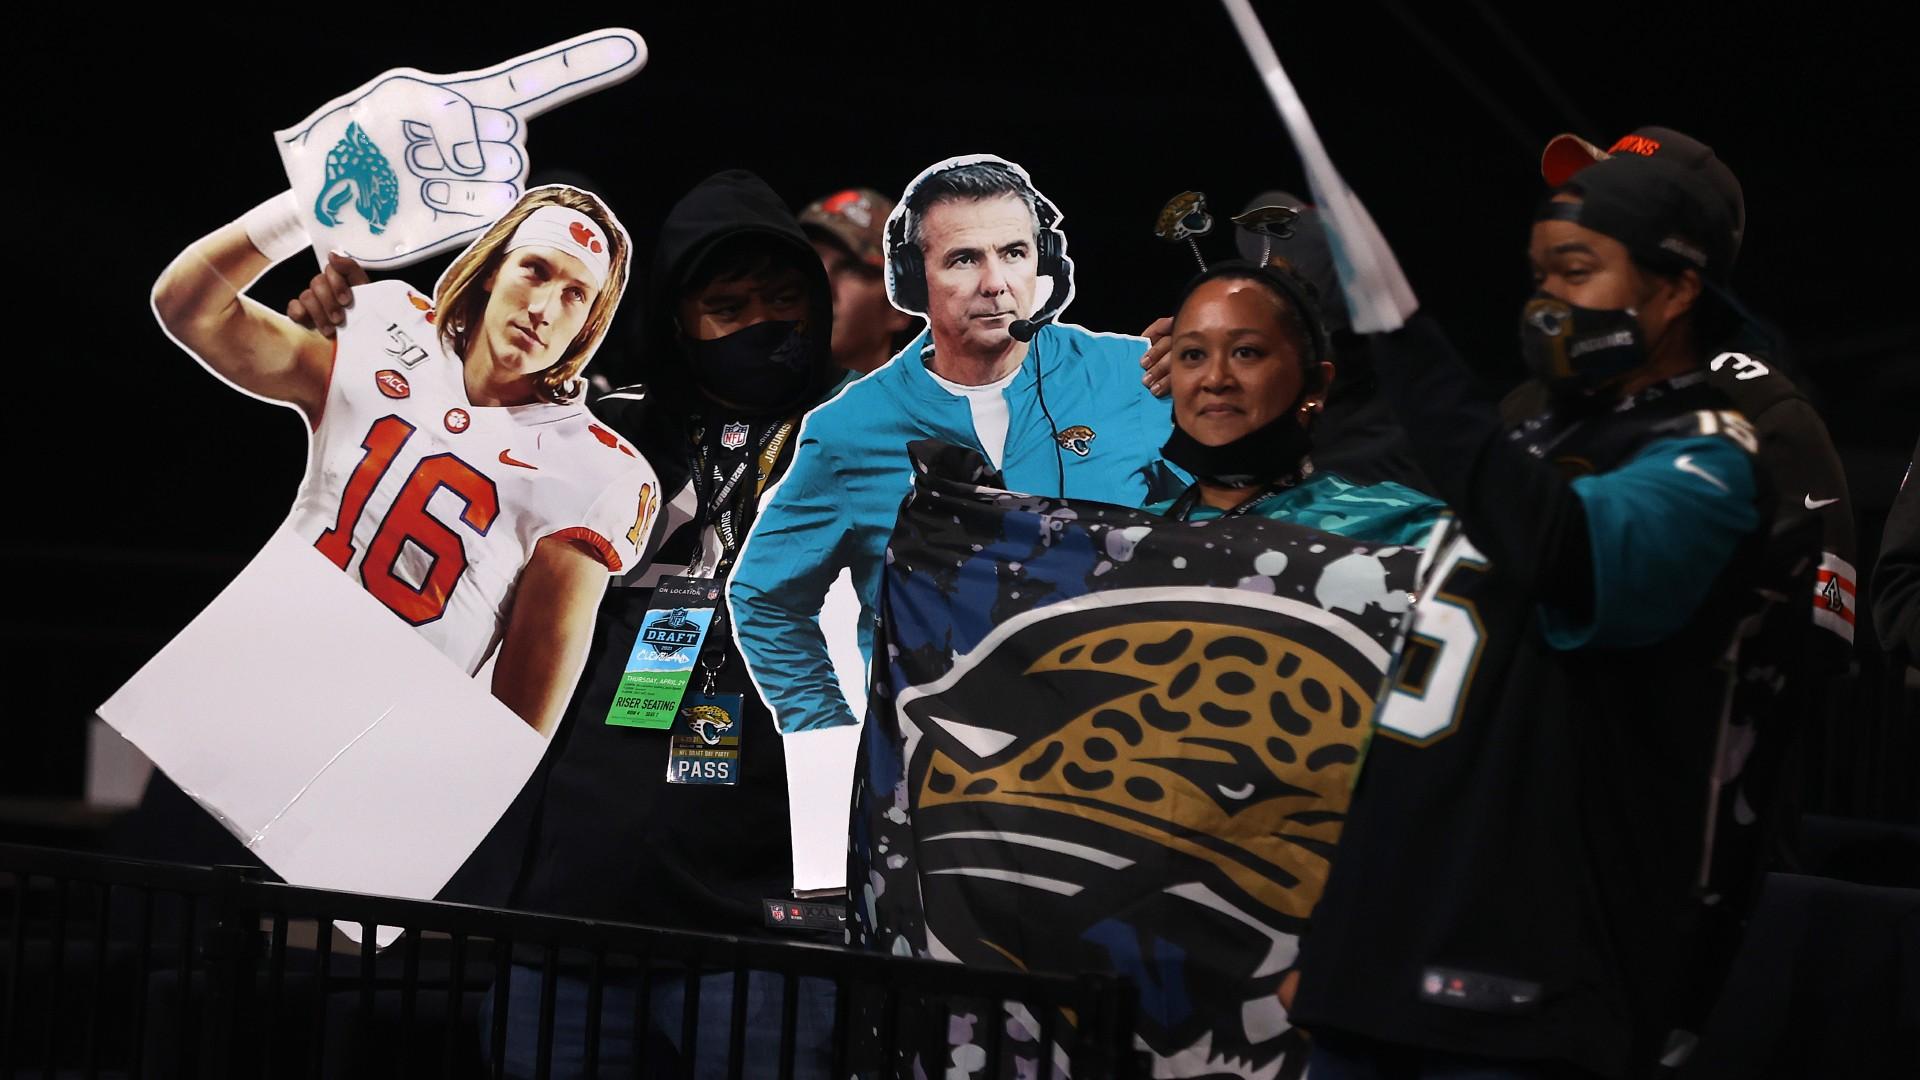 NFL Draft winners & losers 2021: Patriots, Bears, Browns impress; Texans, Packers feel QB woes